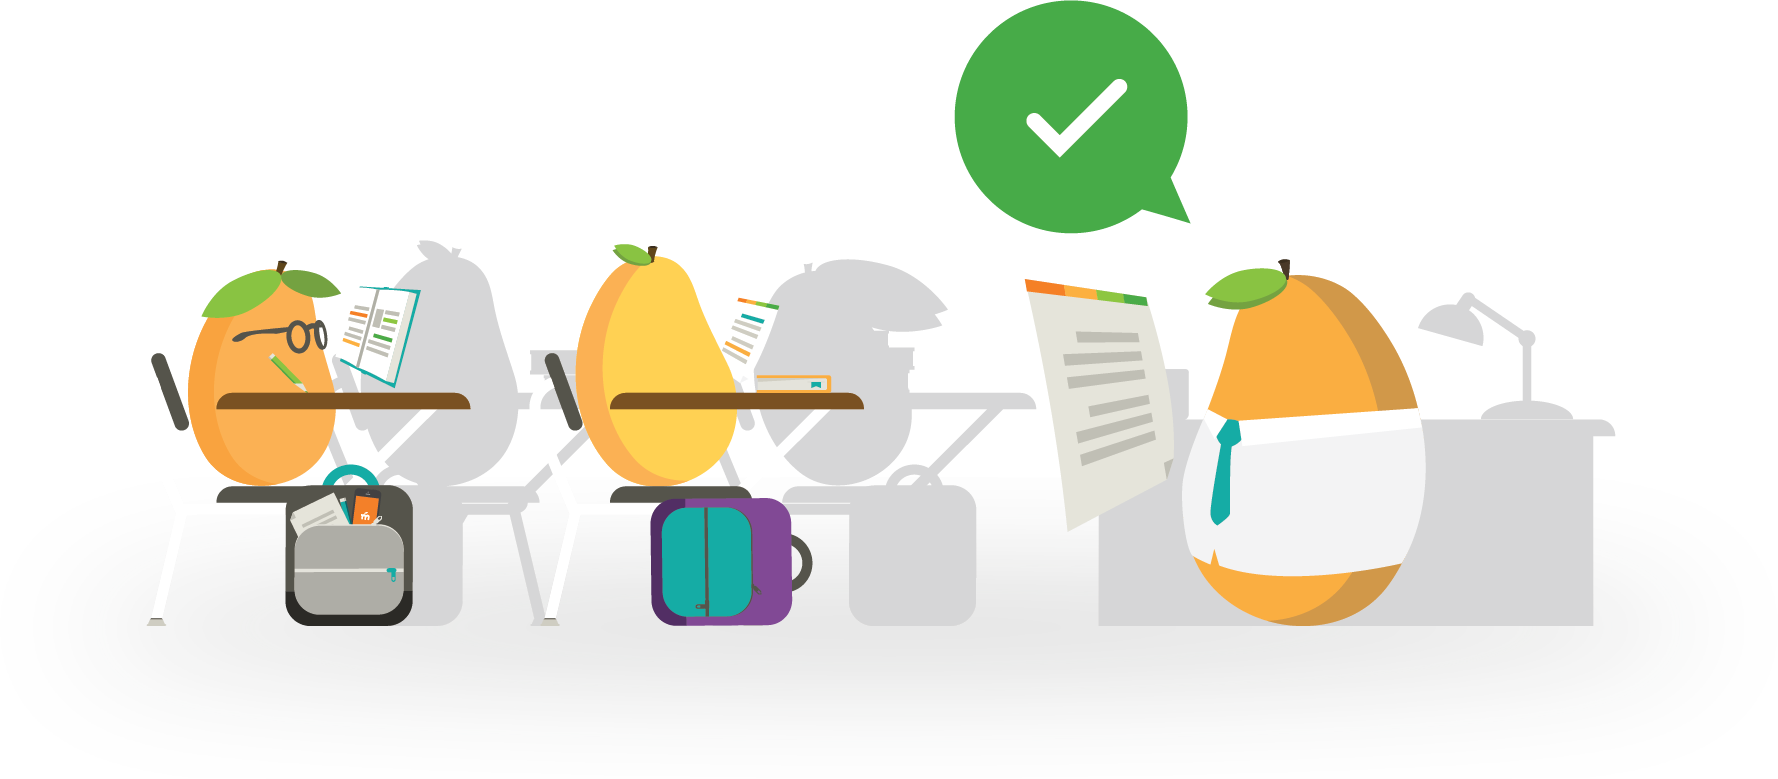 conversations-assessment3x.png